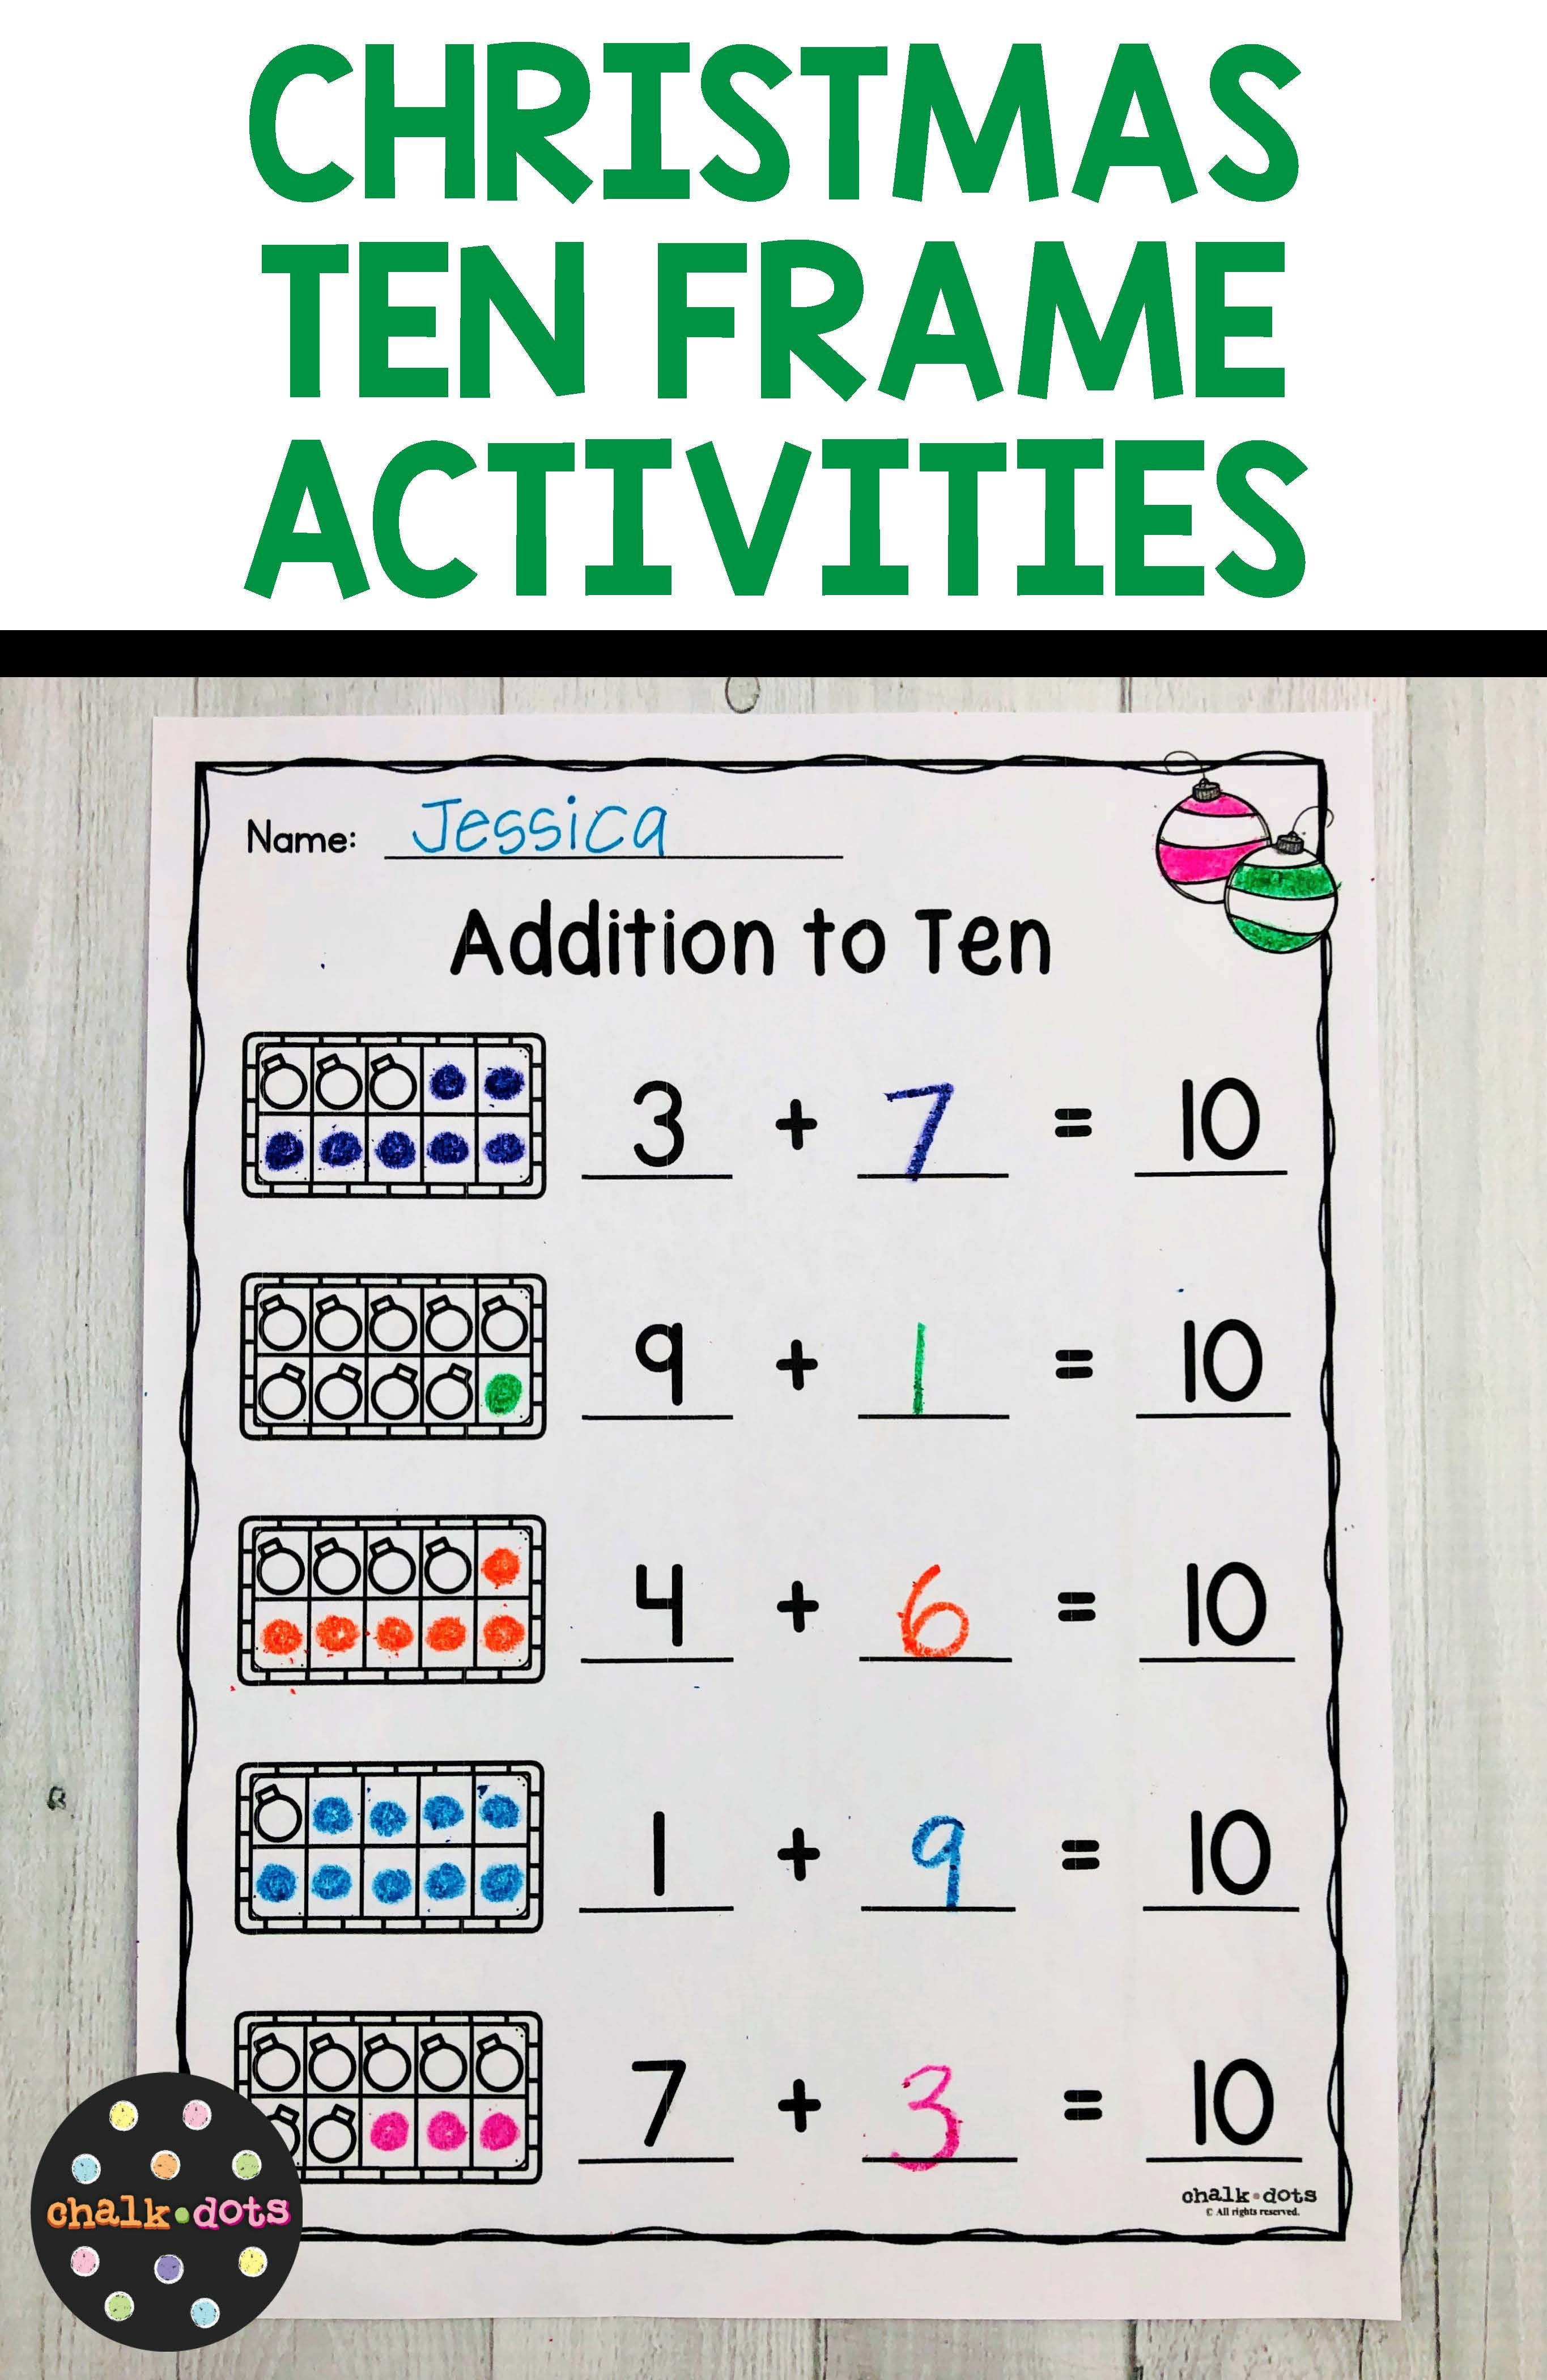 Christmas Ten Frame Activities 1 10